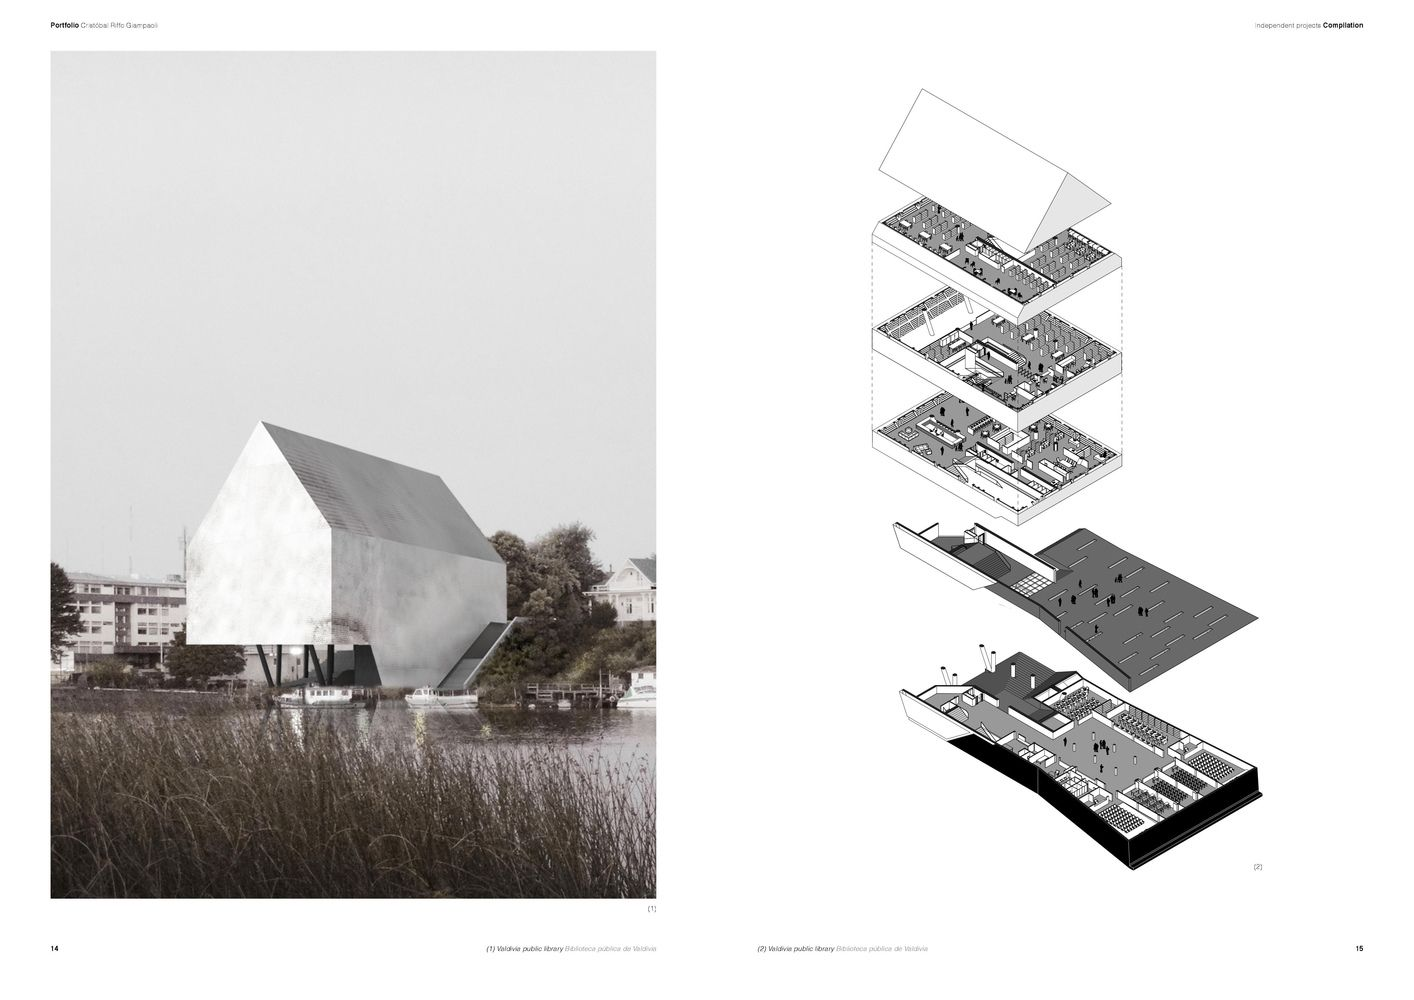 Gallery of the best architecture portfolio designs 15 for Architectural portfolio ideas